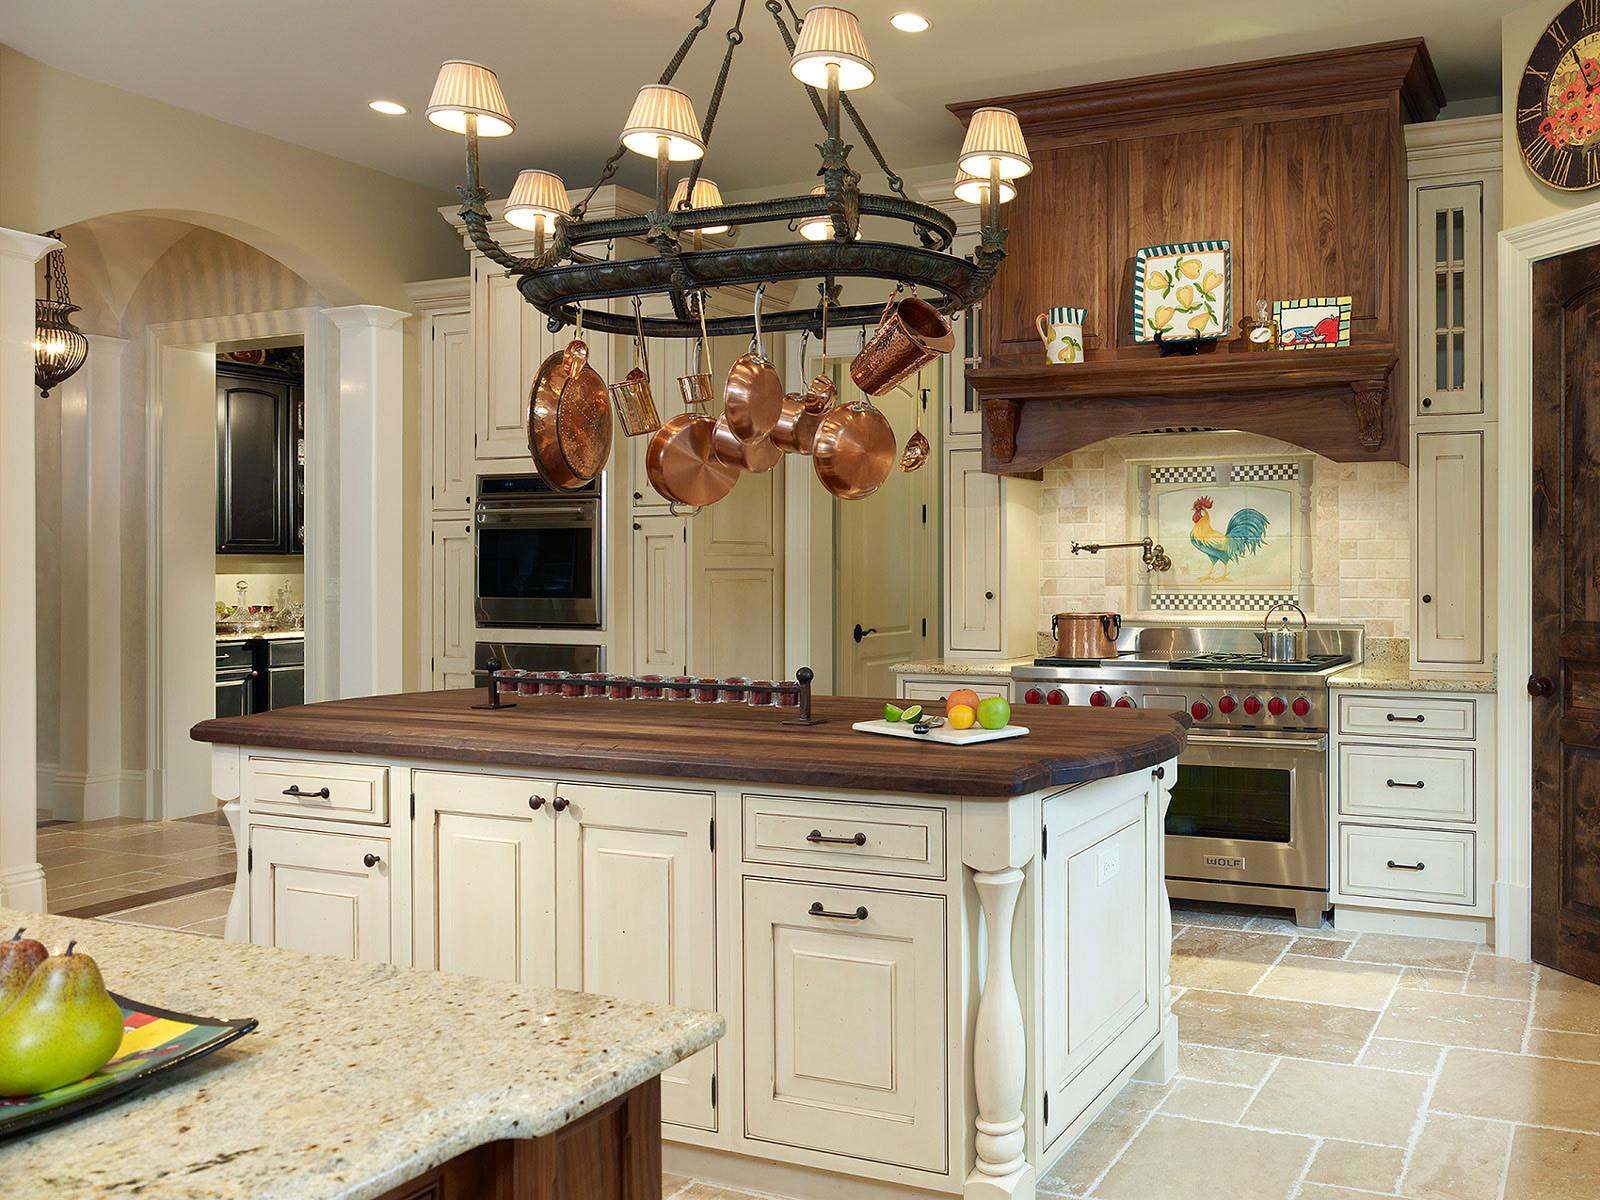 Kitchen Cabinet Manufacturers - Best of Choice | Kitchens ...